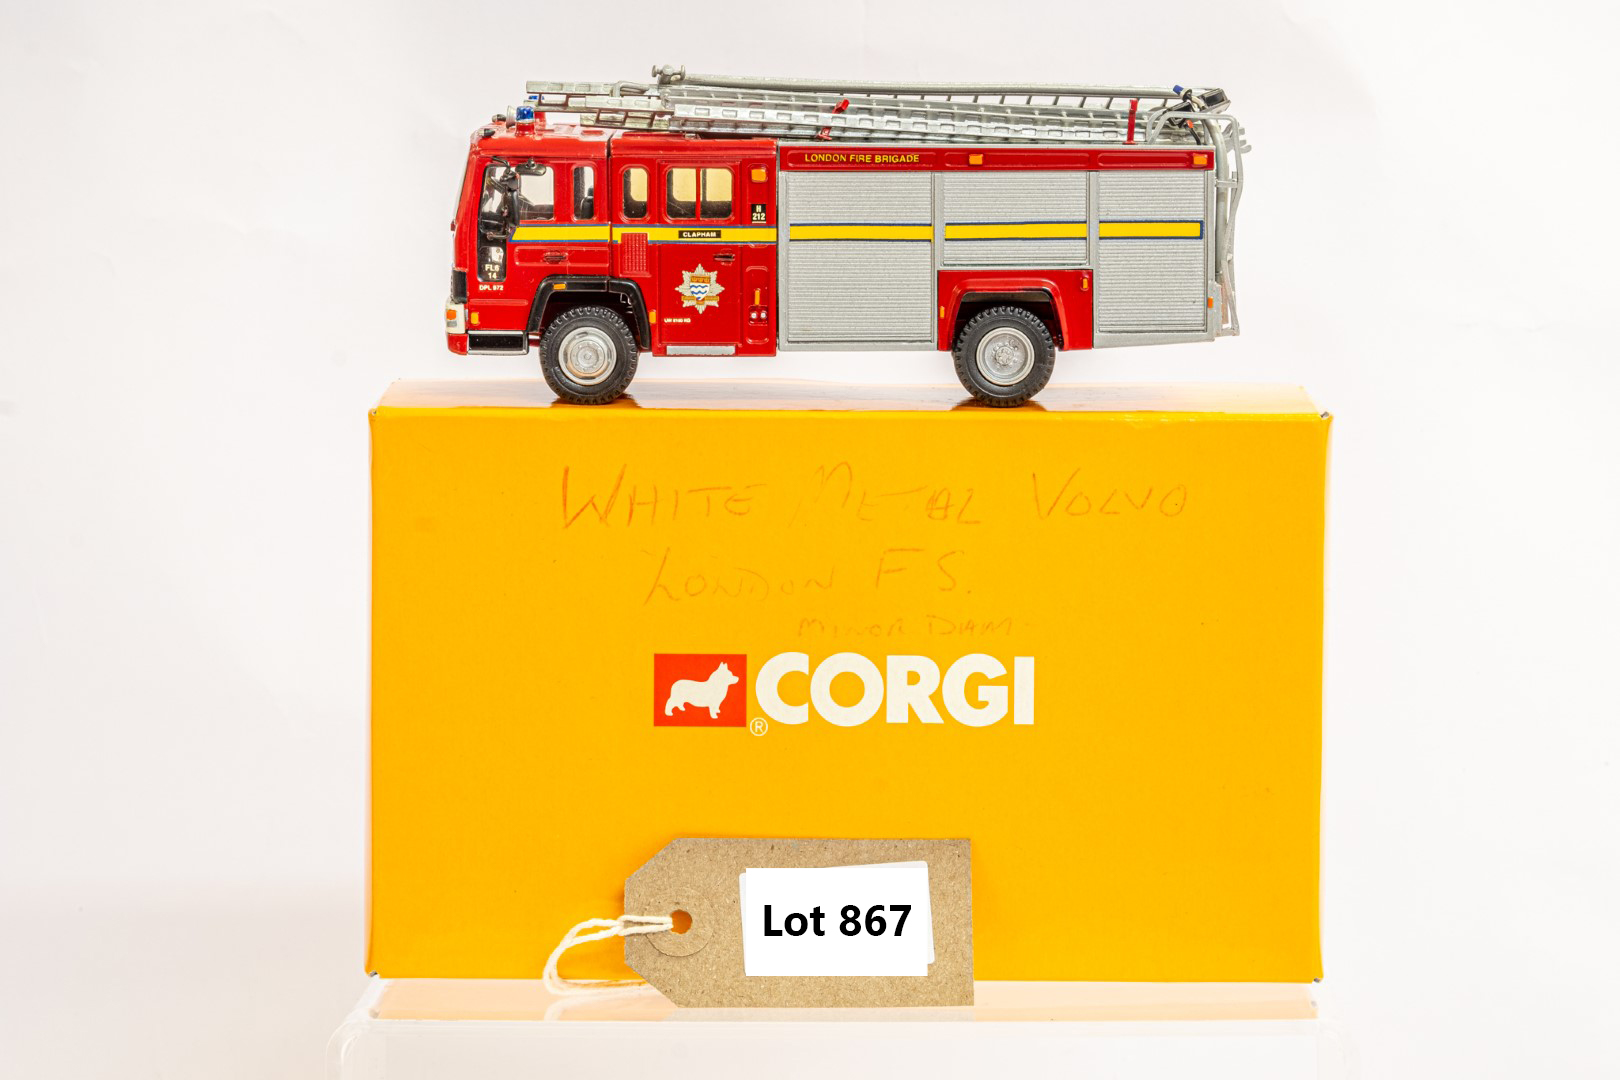 Fire Brigade Models Volvo Fire Engine - Clapham Fire Brigade - In Wrong Box